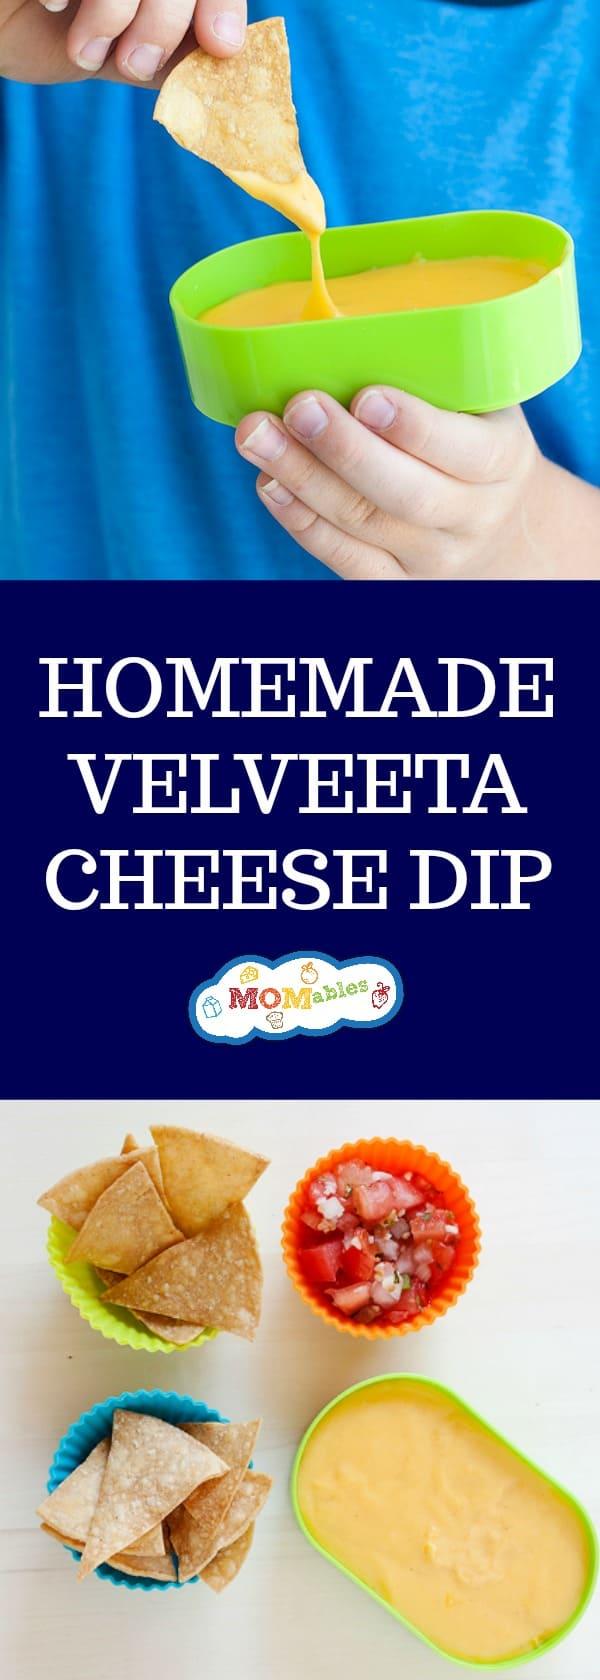 Homemade Velveeta Recipe